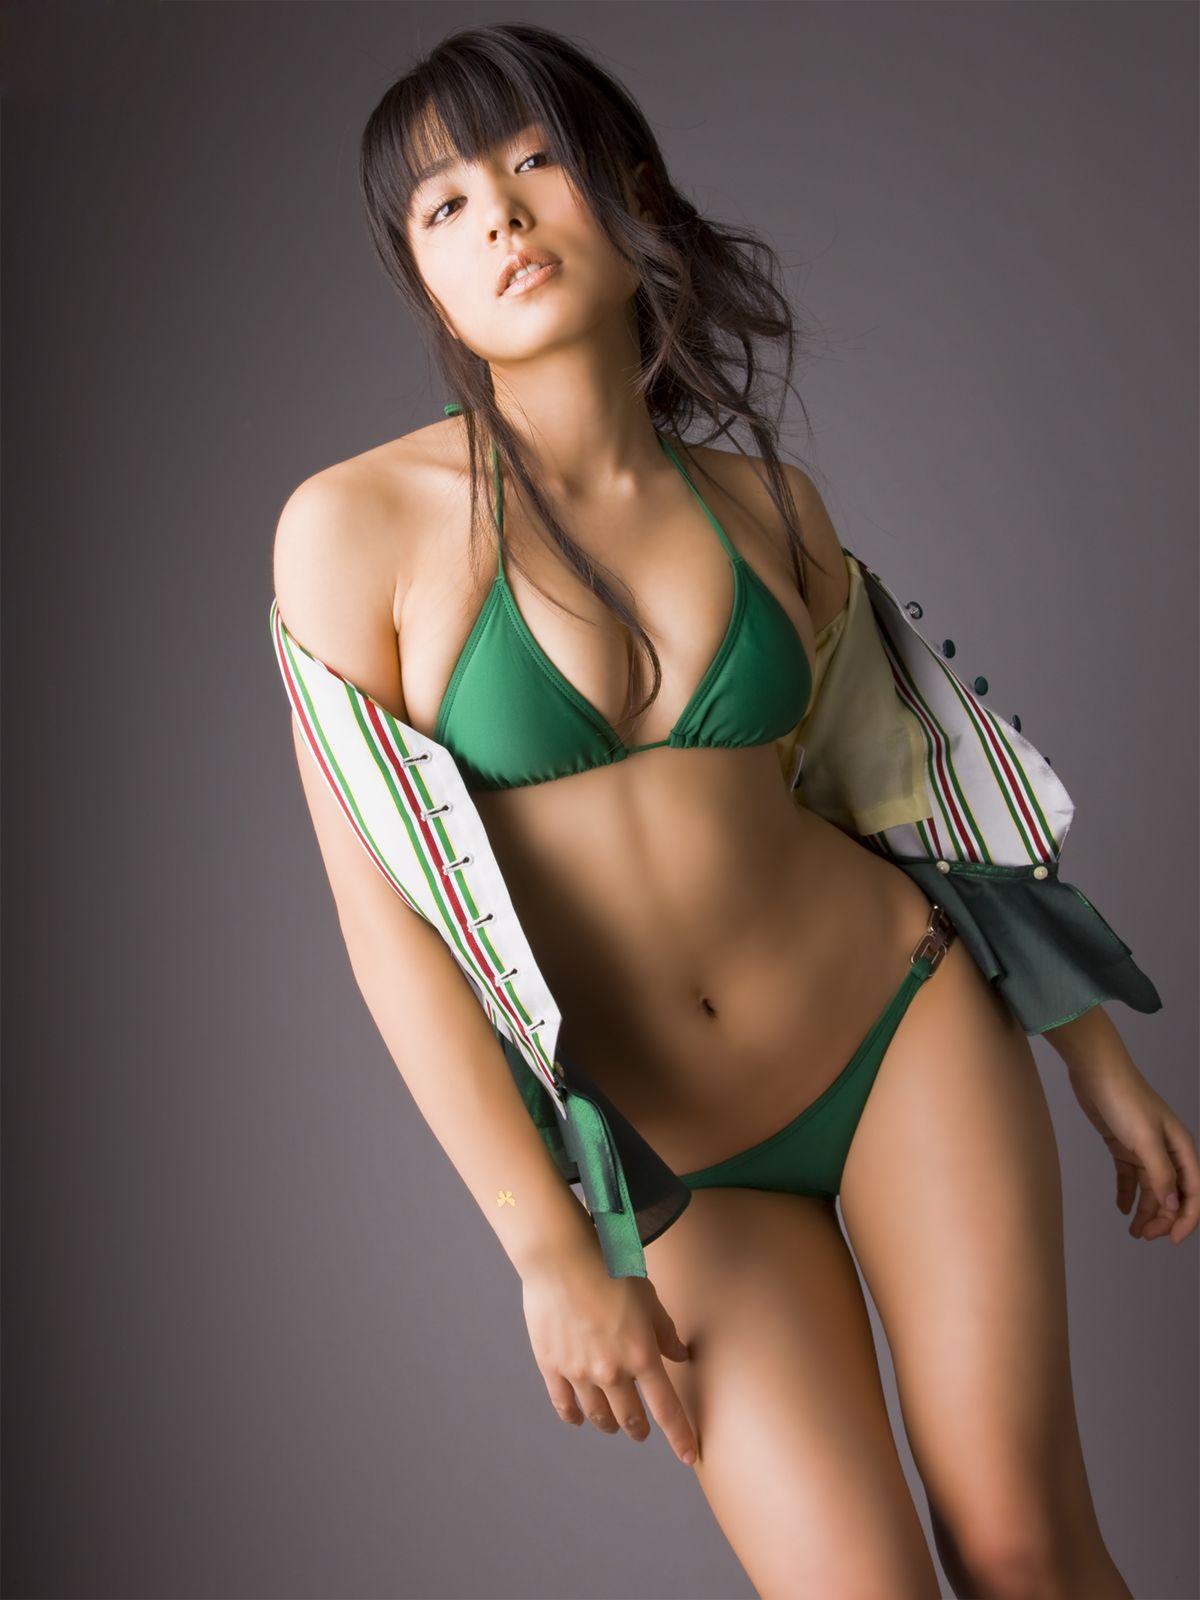 Mature nude russian women 35